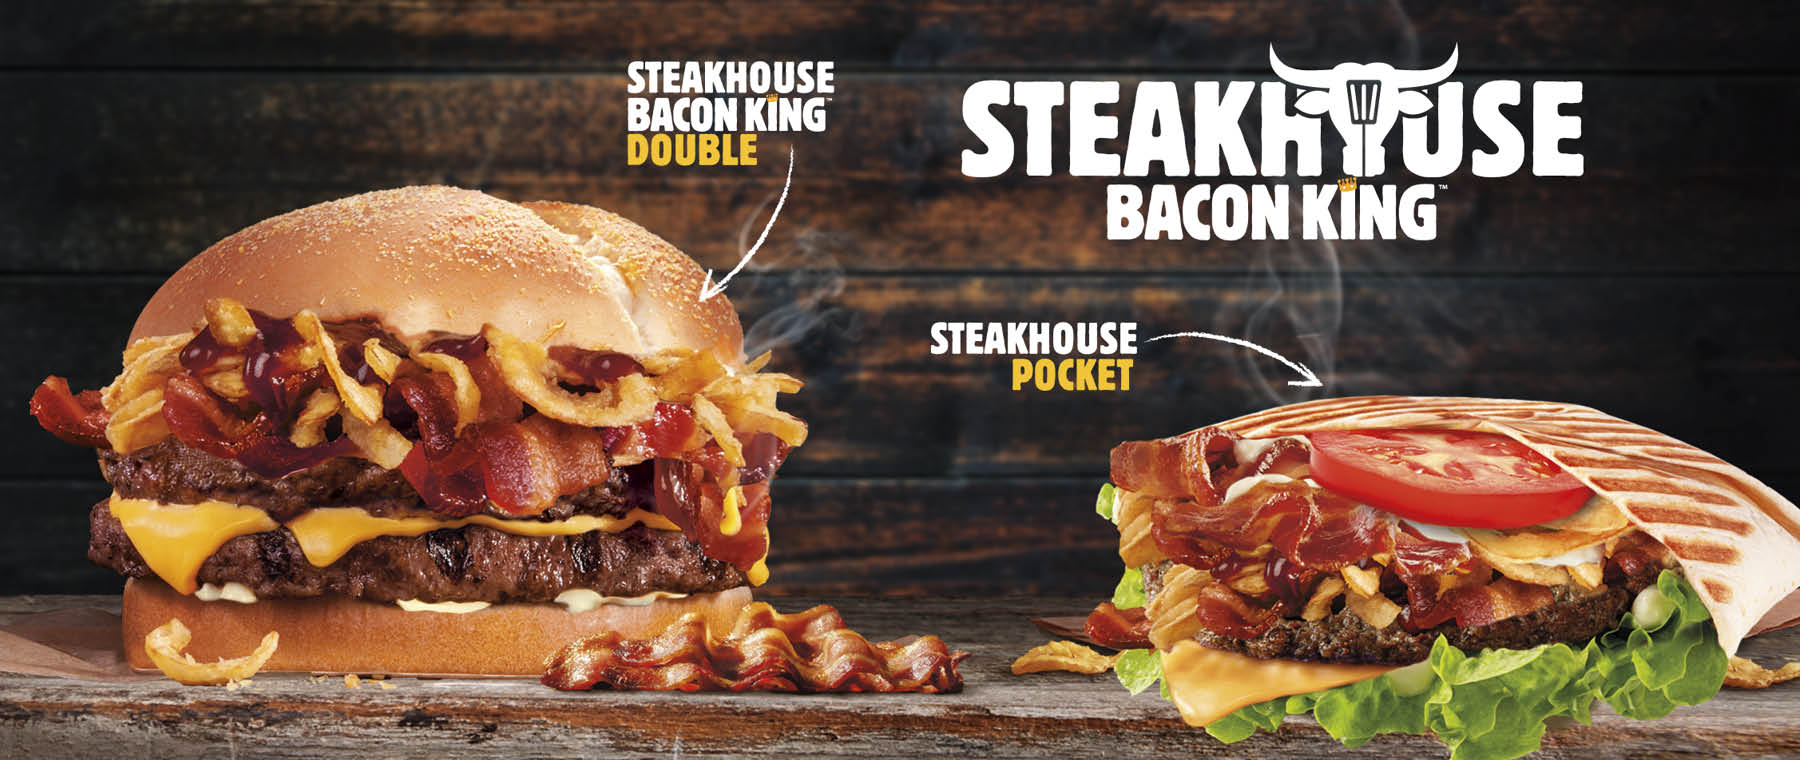 Steakhouse Bacon King